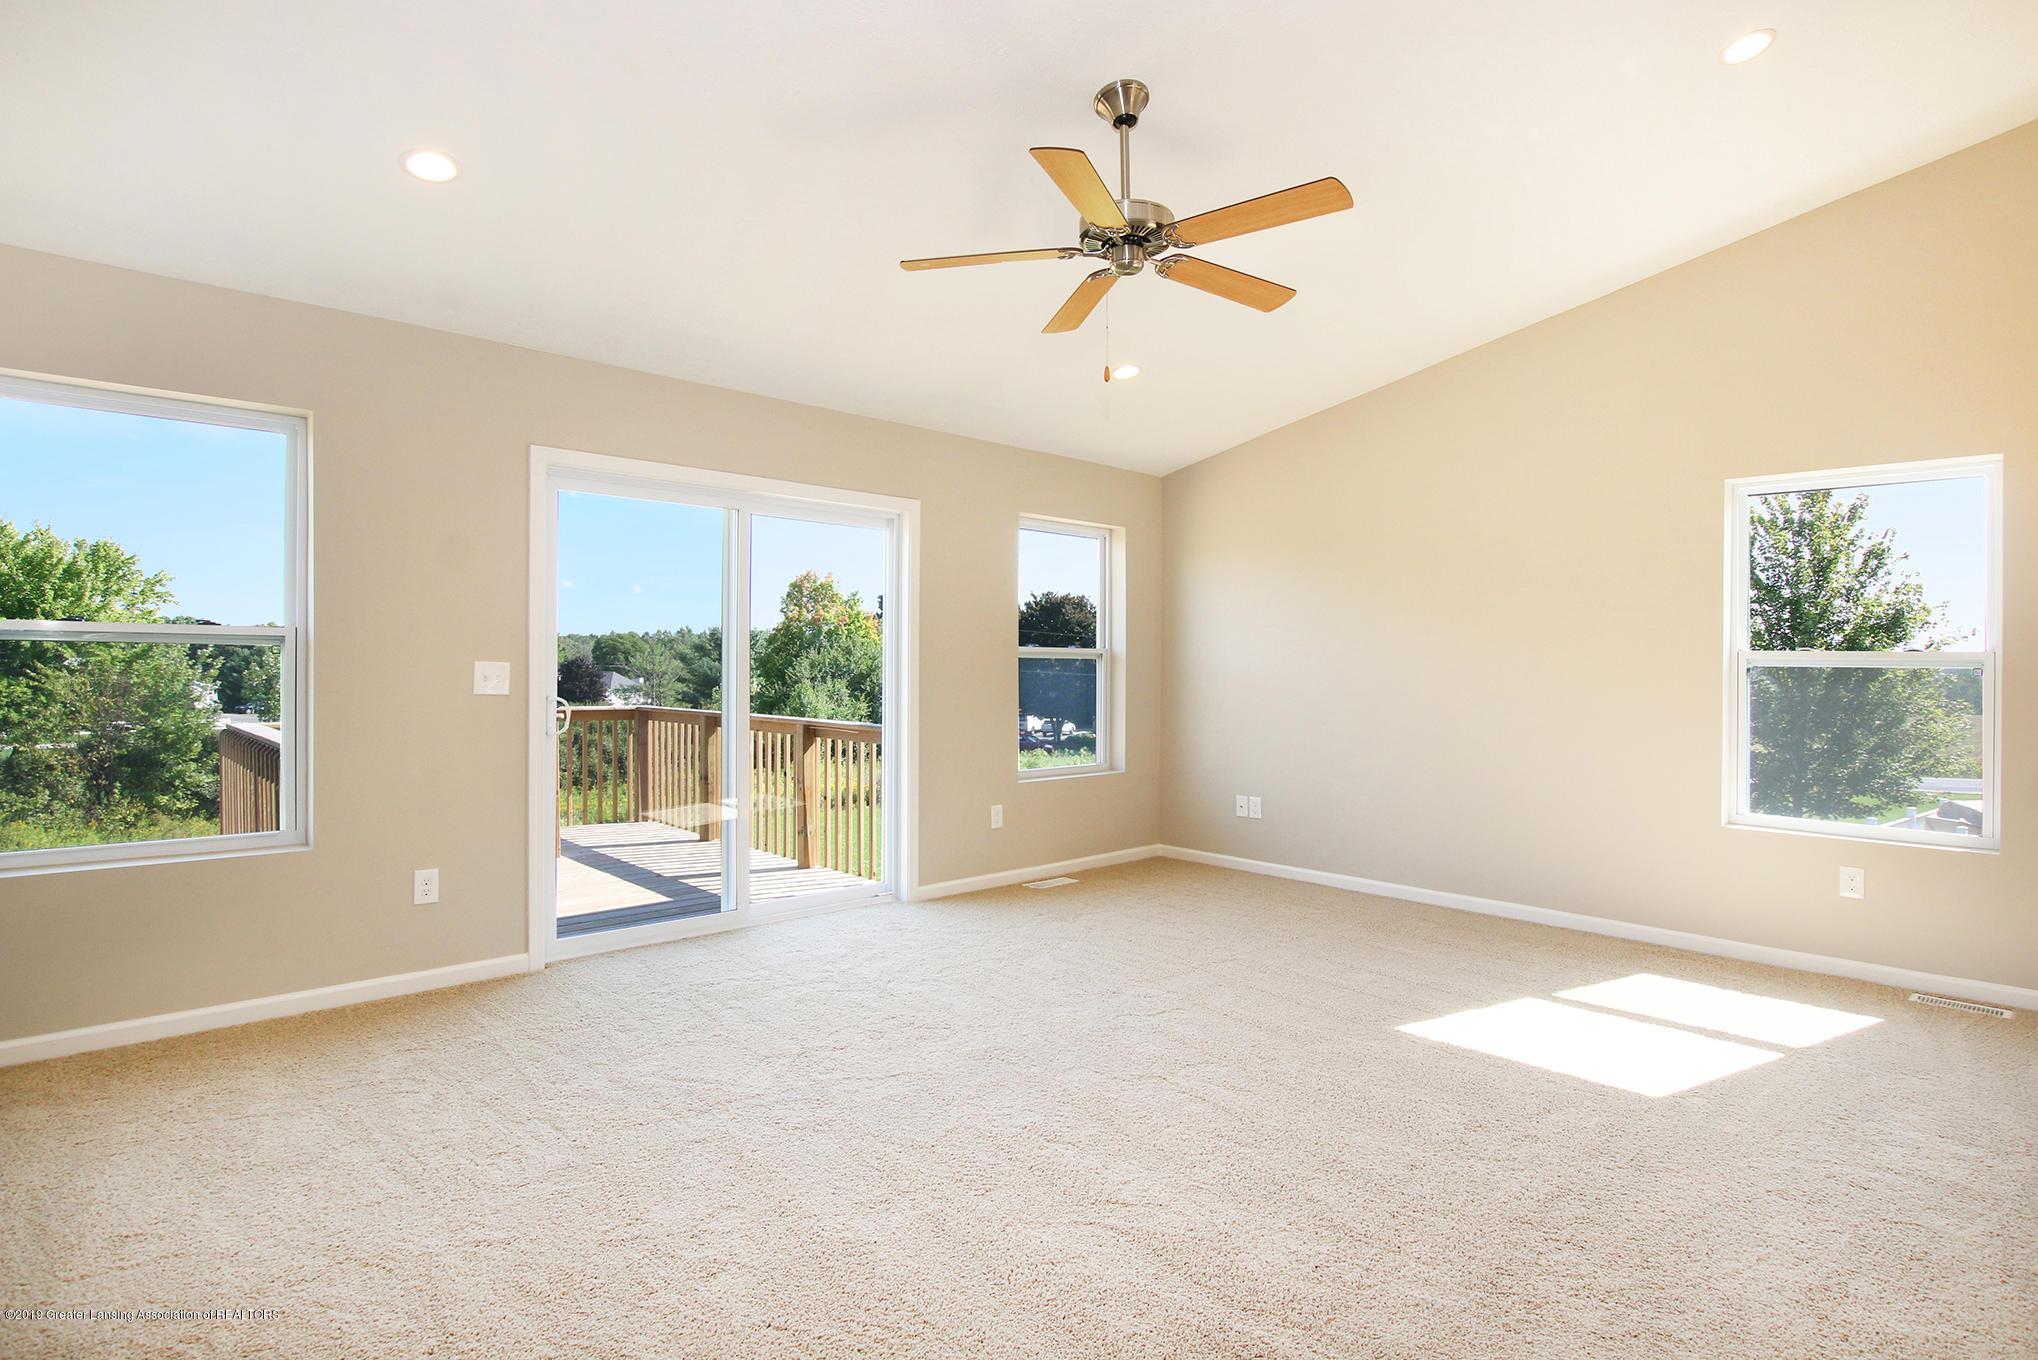 3524 Fernwood Ln - GDN067-C2040 Great Room 2 - 2